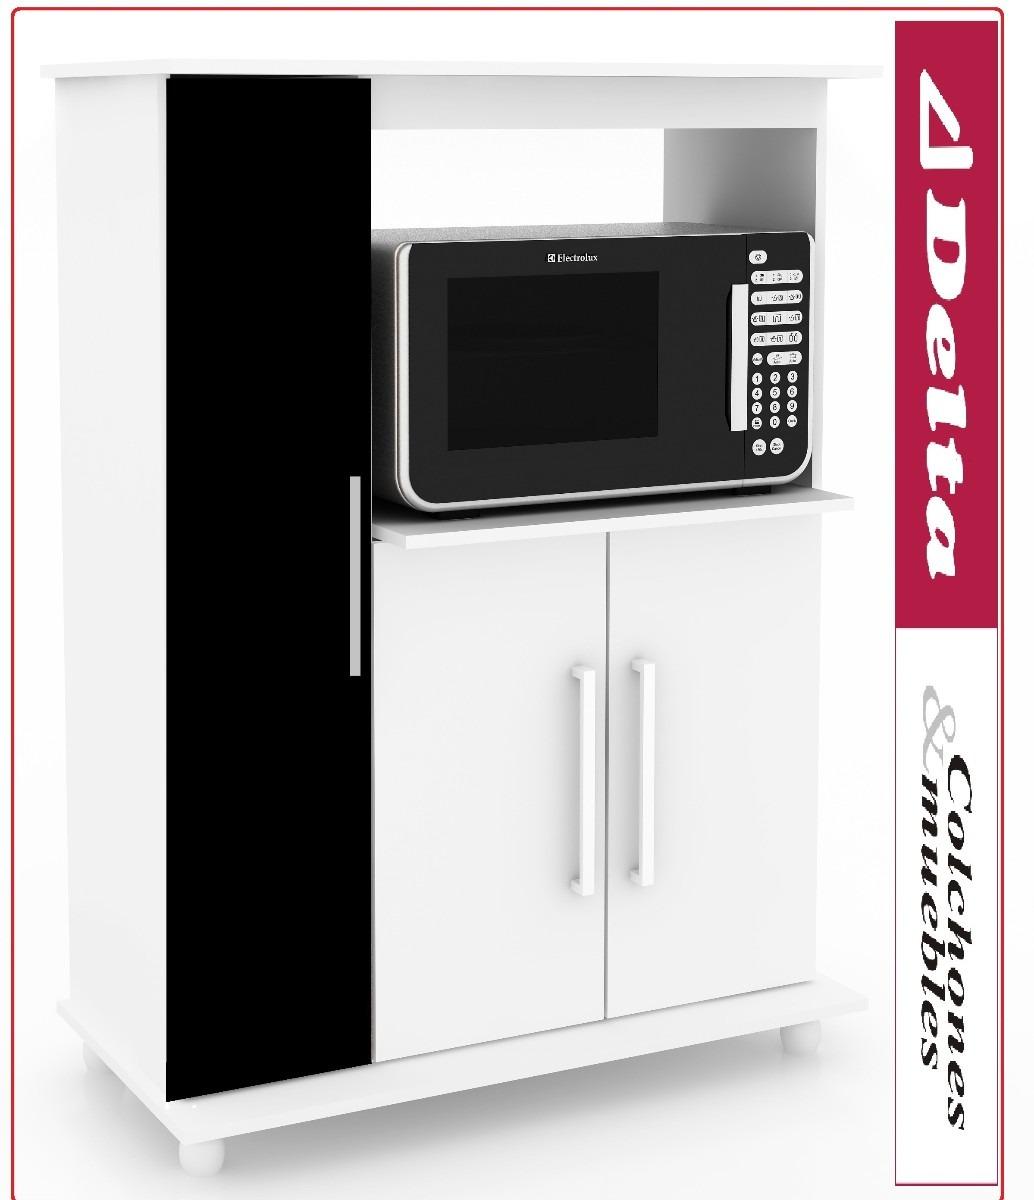 Mueble para microondas alacena kit de cocina equipamiento - Mueble microondas ...